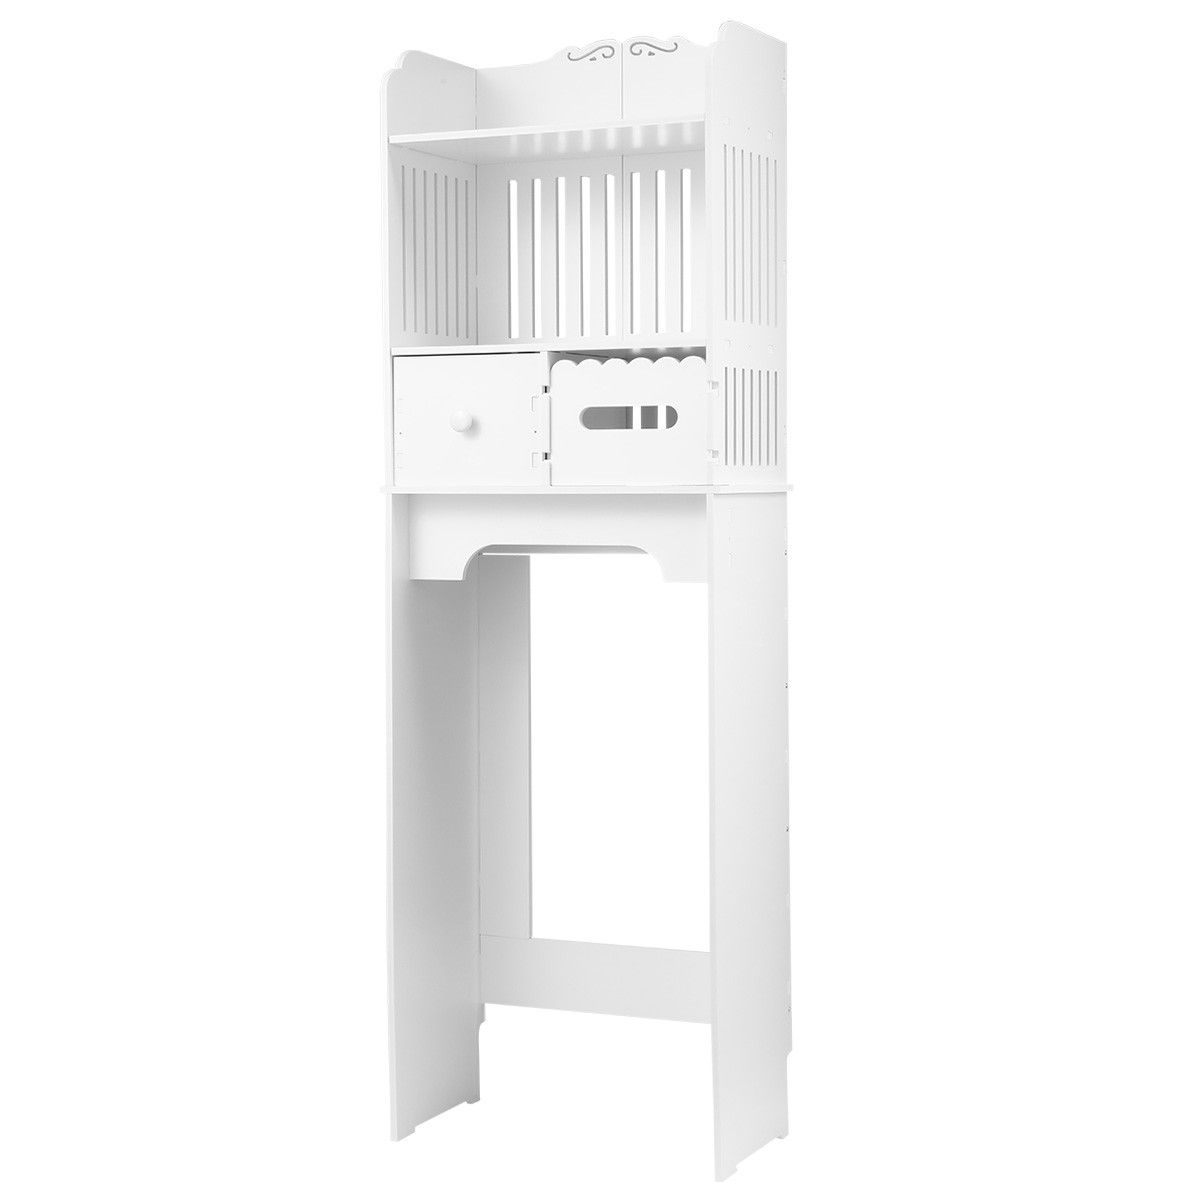 Over the Toilet Storage Cabinet Shelf Bathroom Organiser Stand White